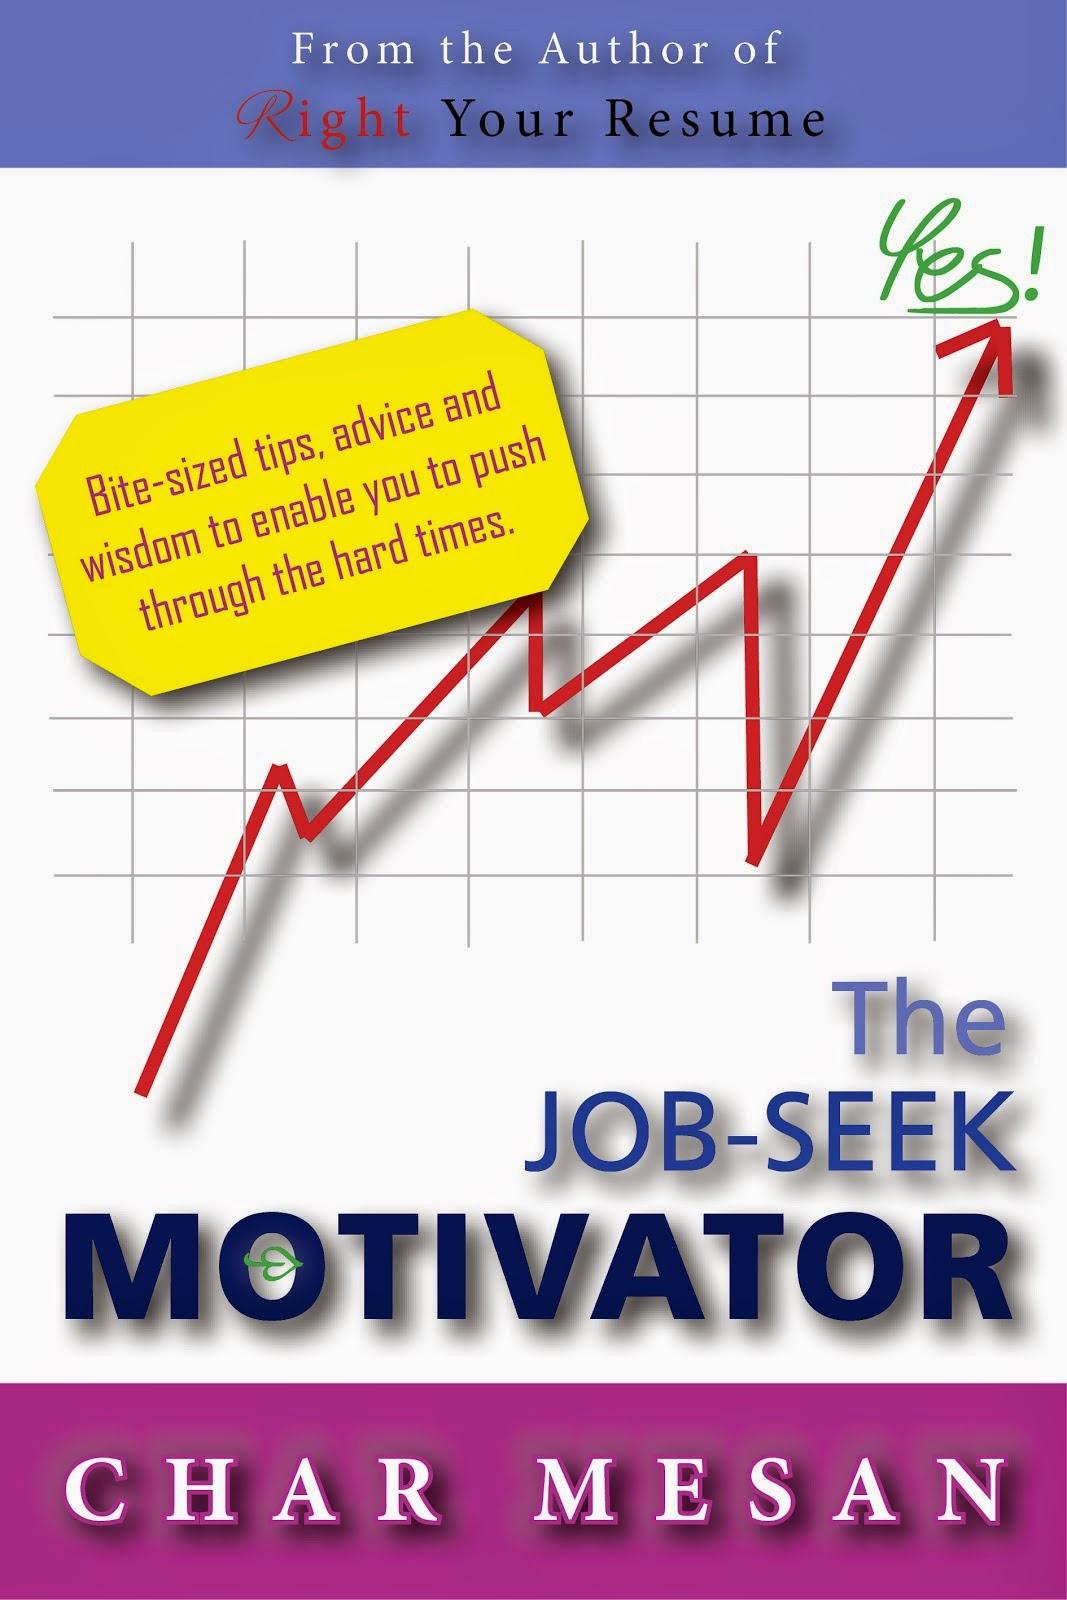 Char Mesan Job Search Training Free Job Search Action